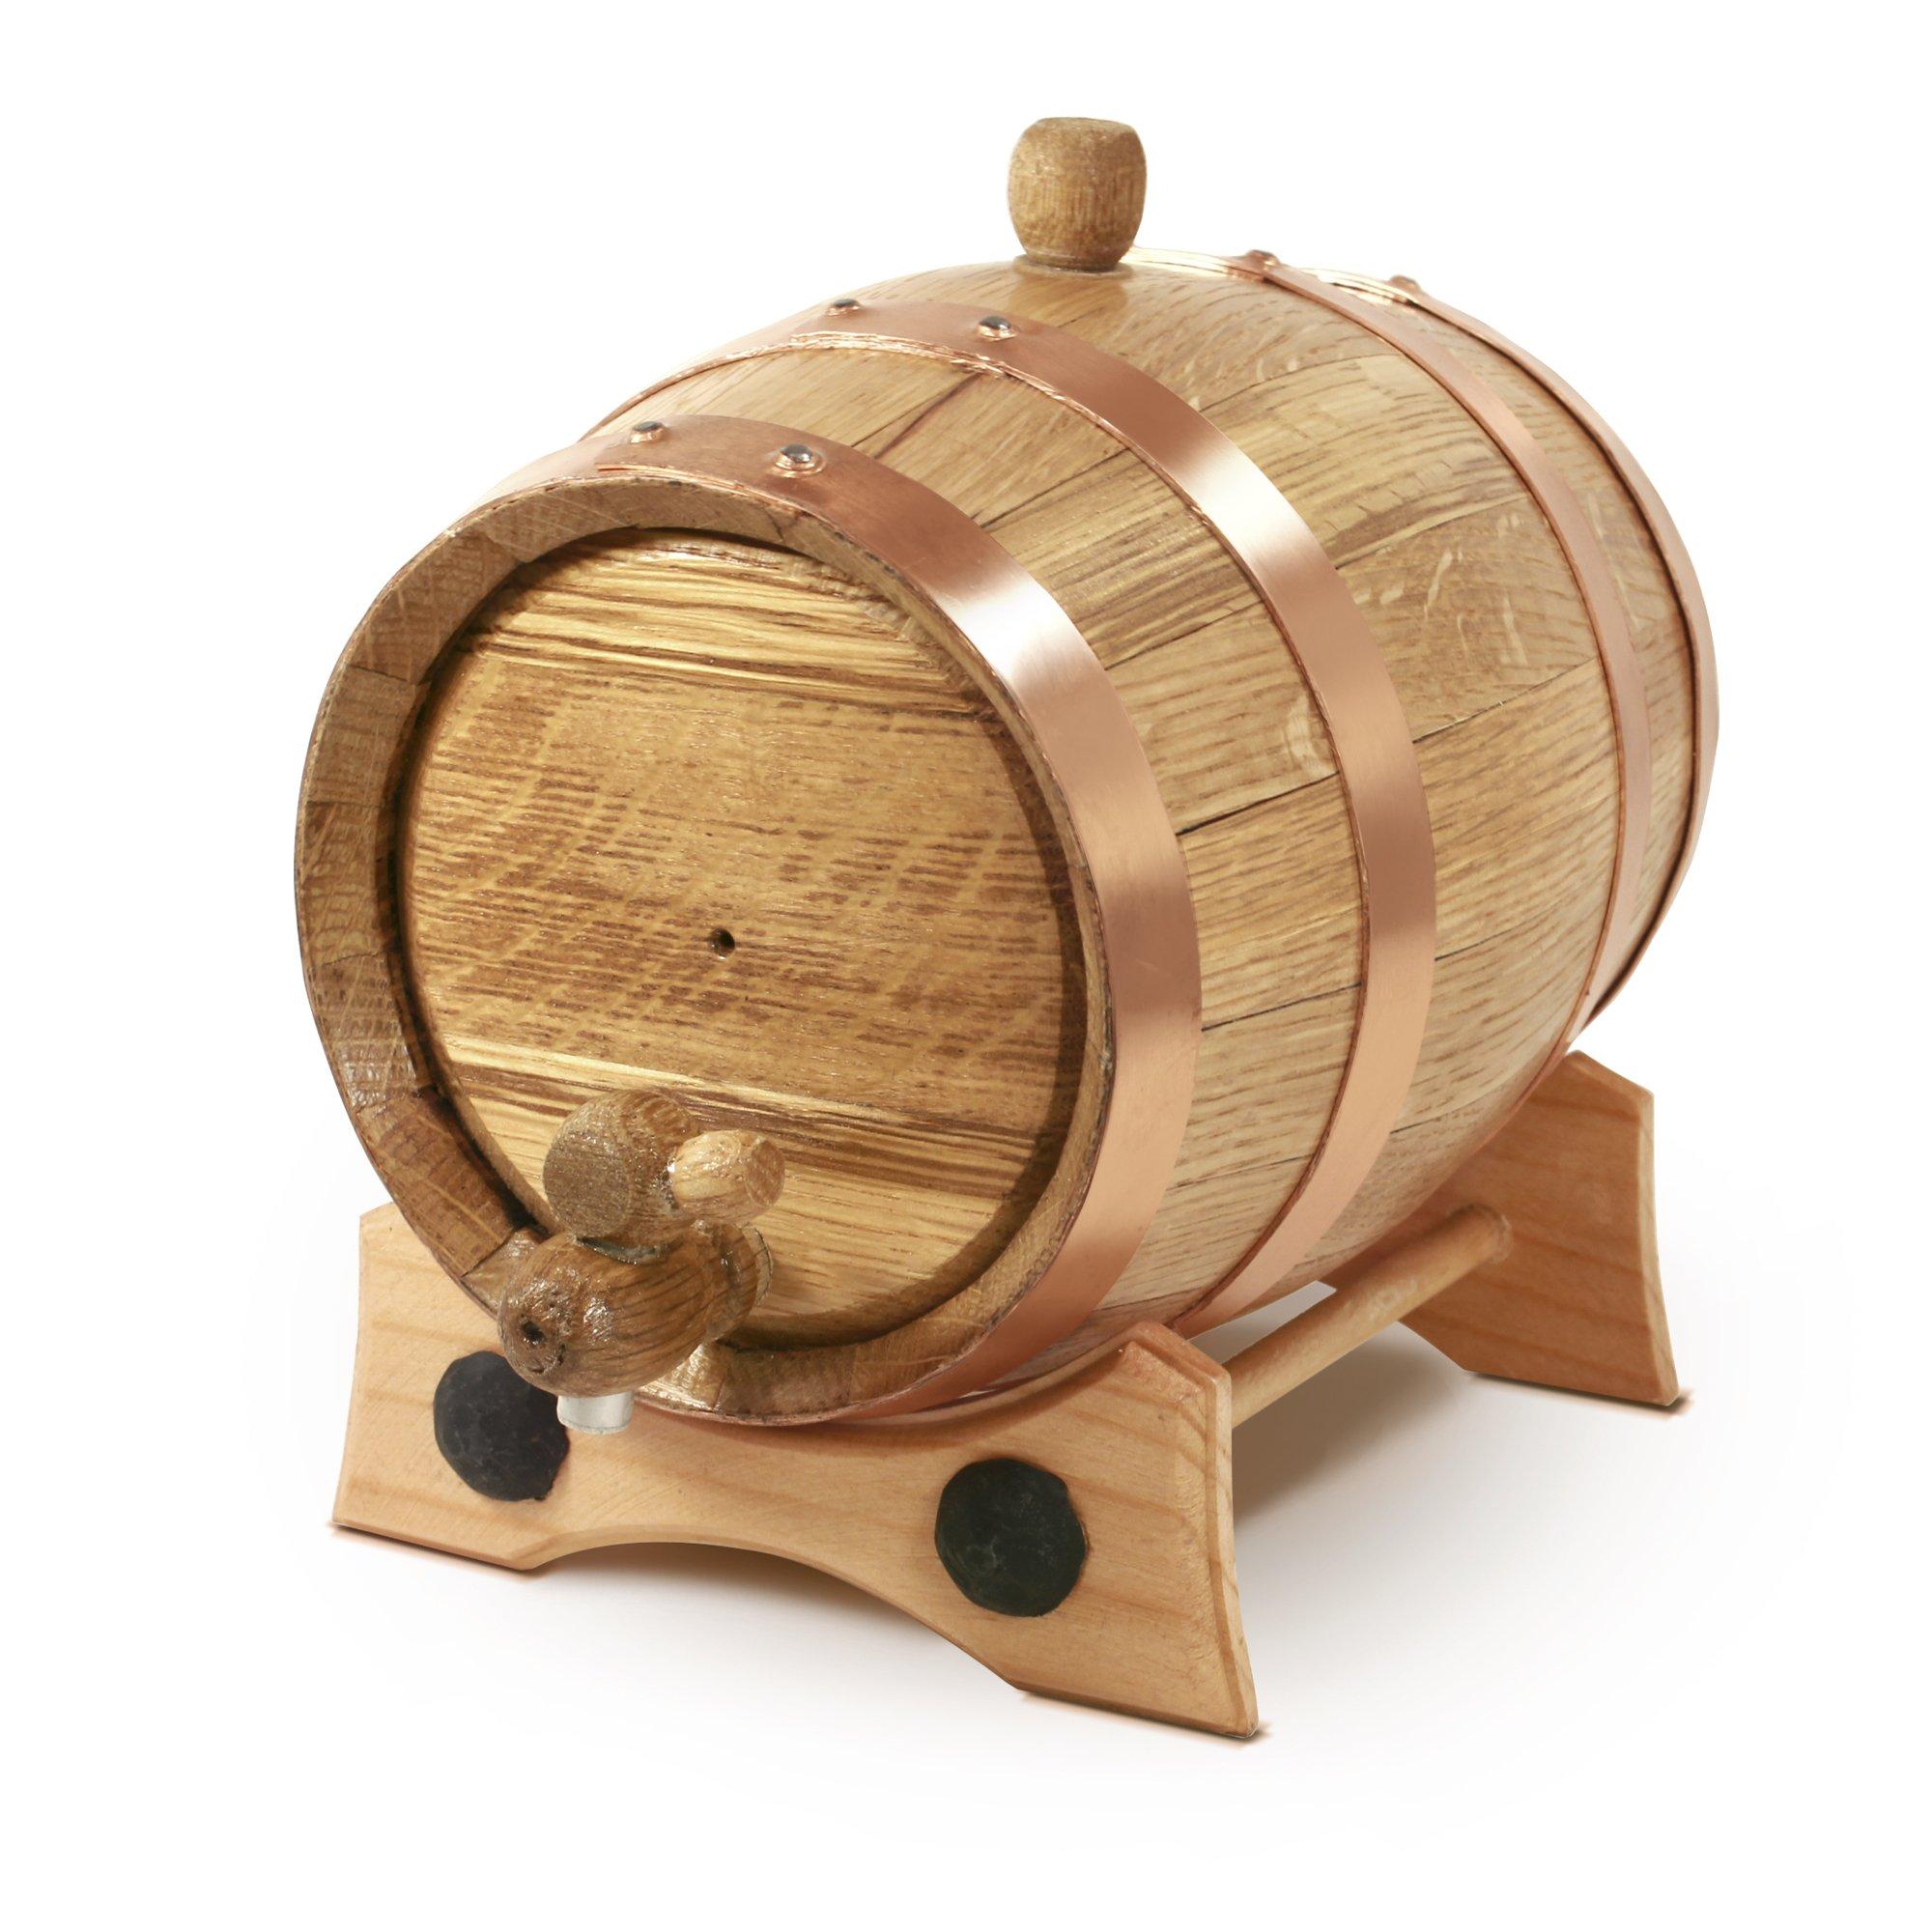 1 Liter Whiskey Oak Barrel for Aging – Golden Oak Barrel with Copper Hoops – Aging and Recipes Digital Guide included